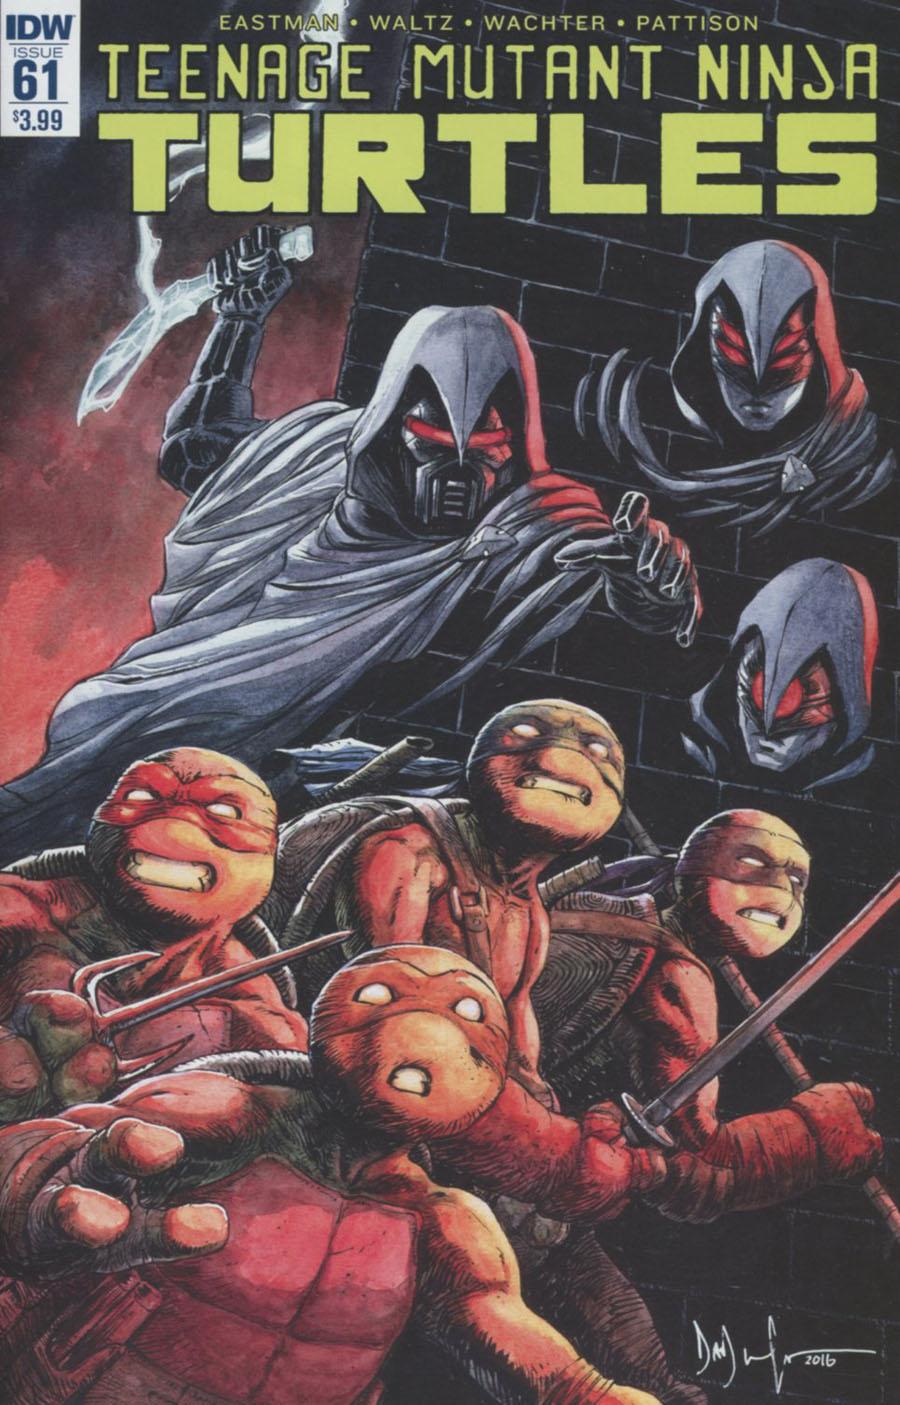 Teenage Mutant Ninja Turtles Vol 5 #61 Cover A Regular Dave Wachter Cover